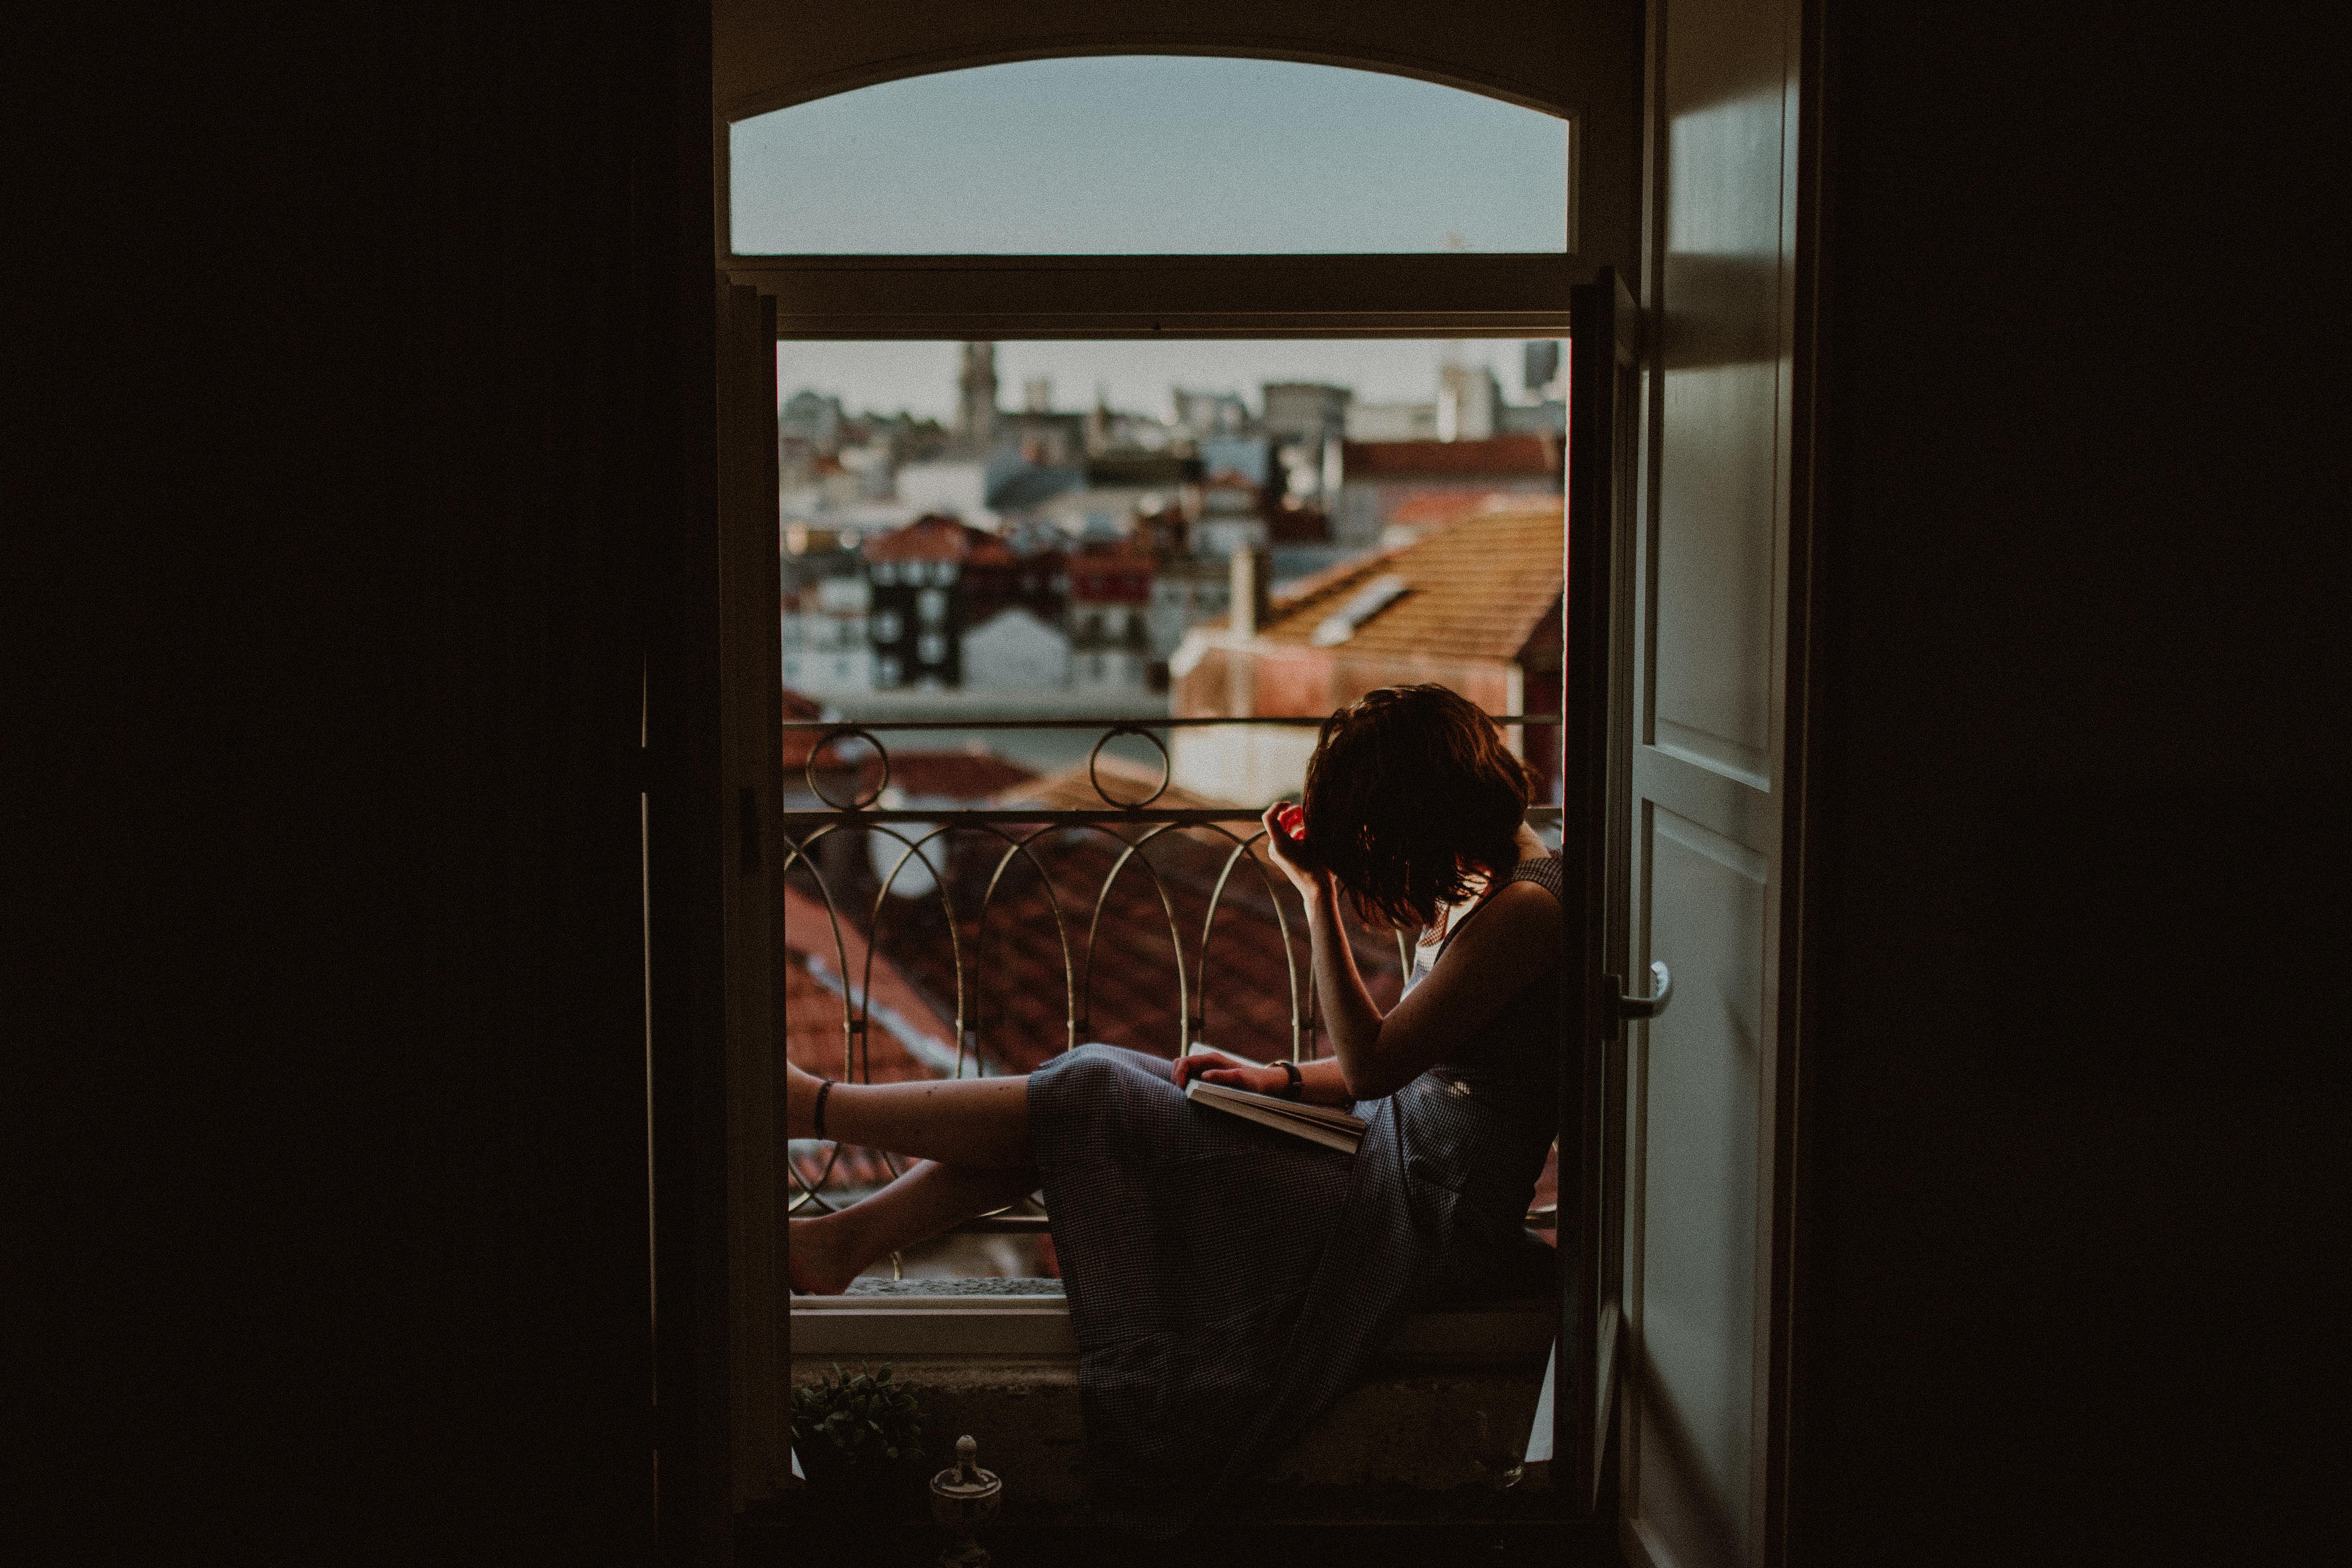 woman wearing gray dress sitting near window during daytime